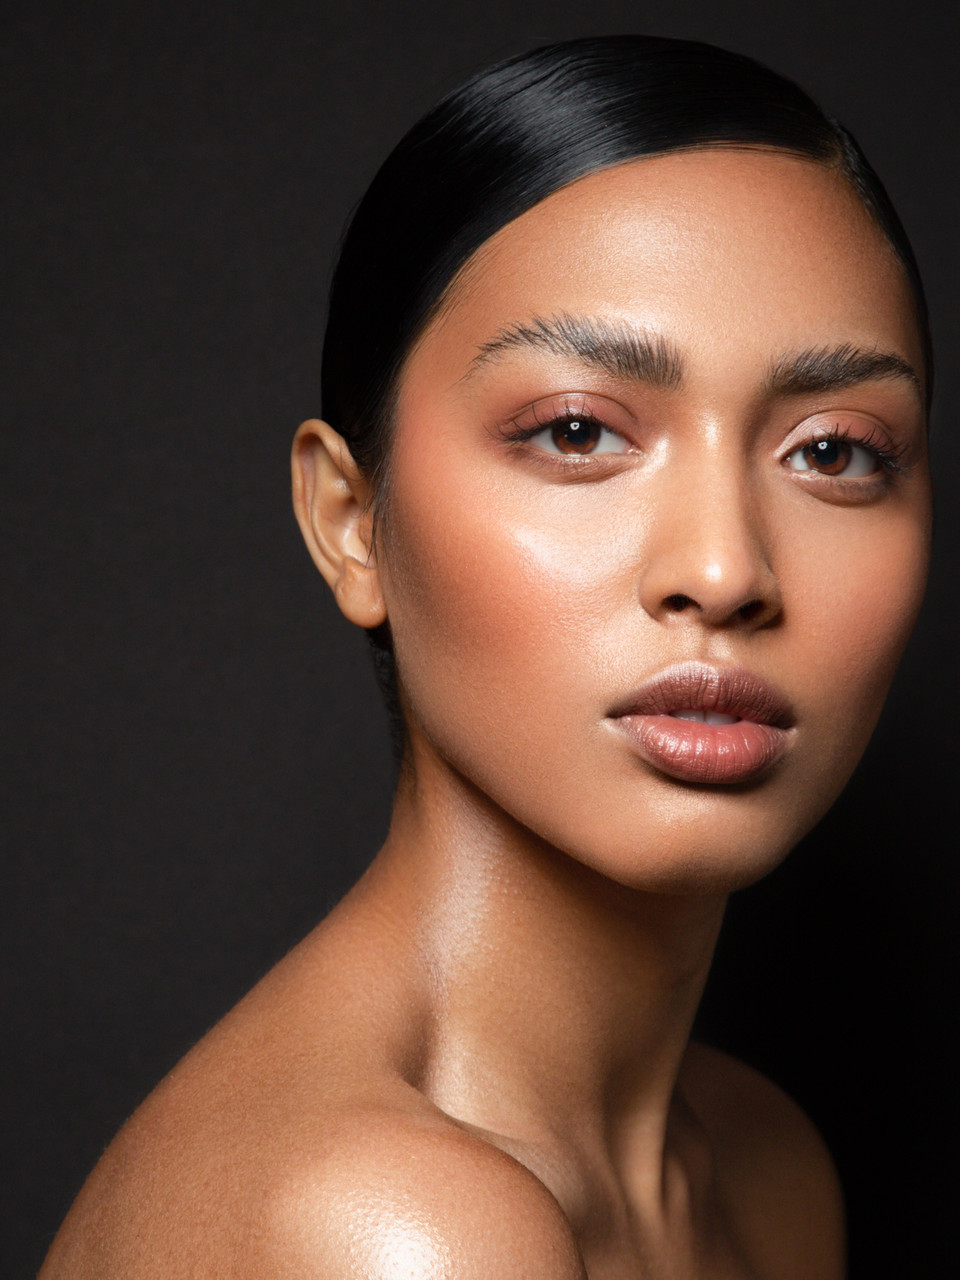 caitlin wyman clean beauty xiox magazine